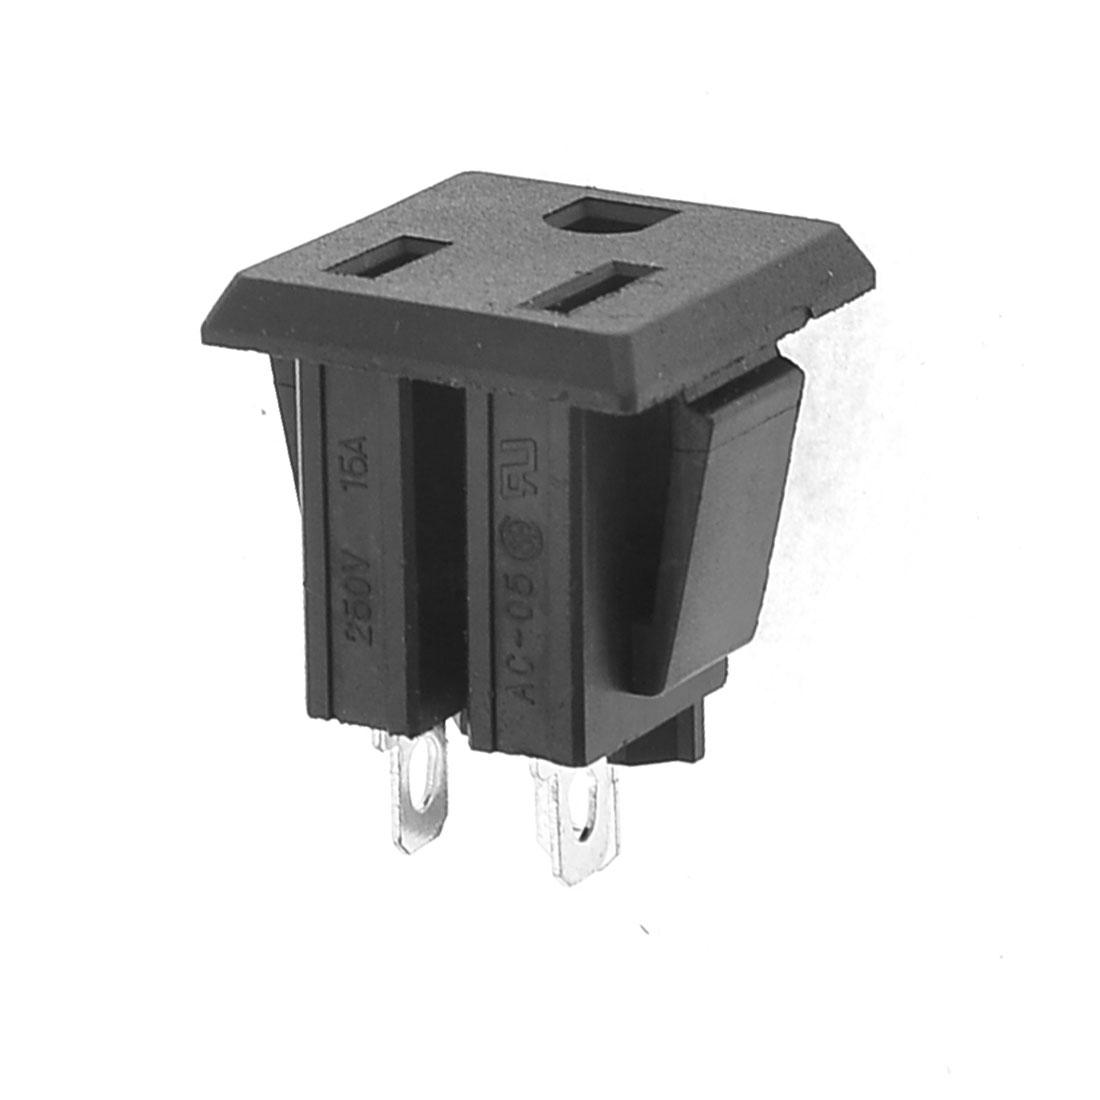 Black 3 Jacks Canadian Residential US Power Socket 250V 15A